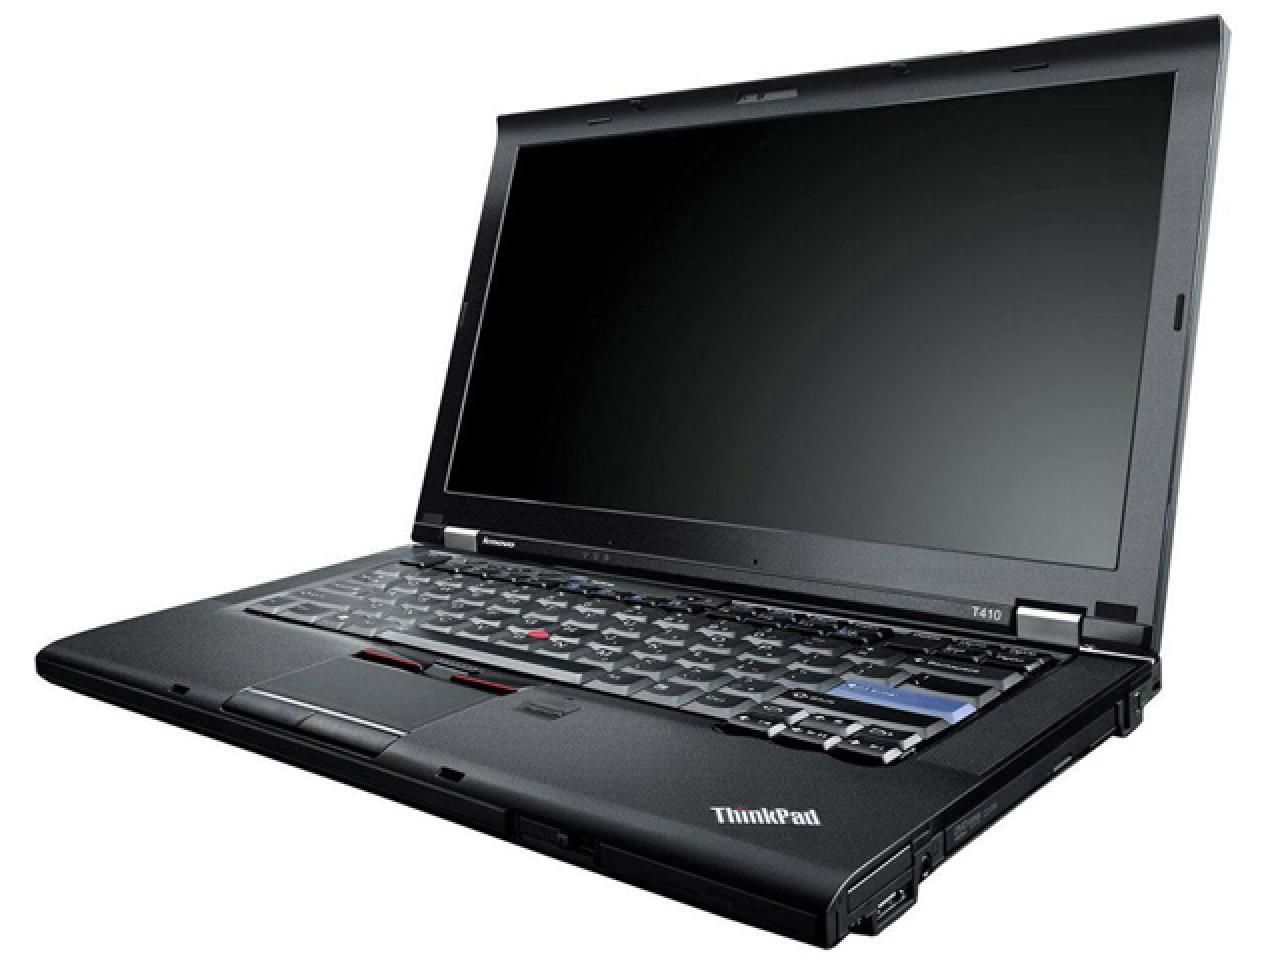 Lenovo Thinkpad T410  - shop.bb-net.de